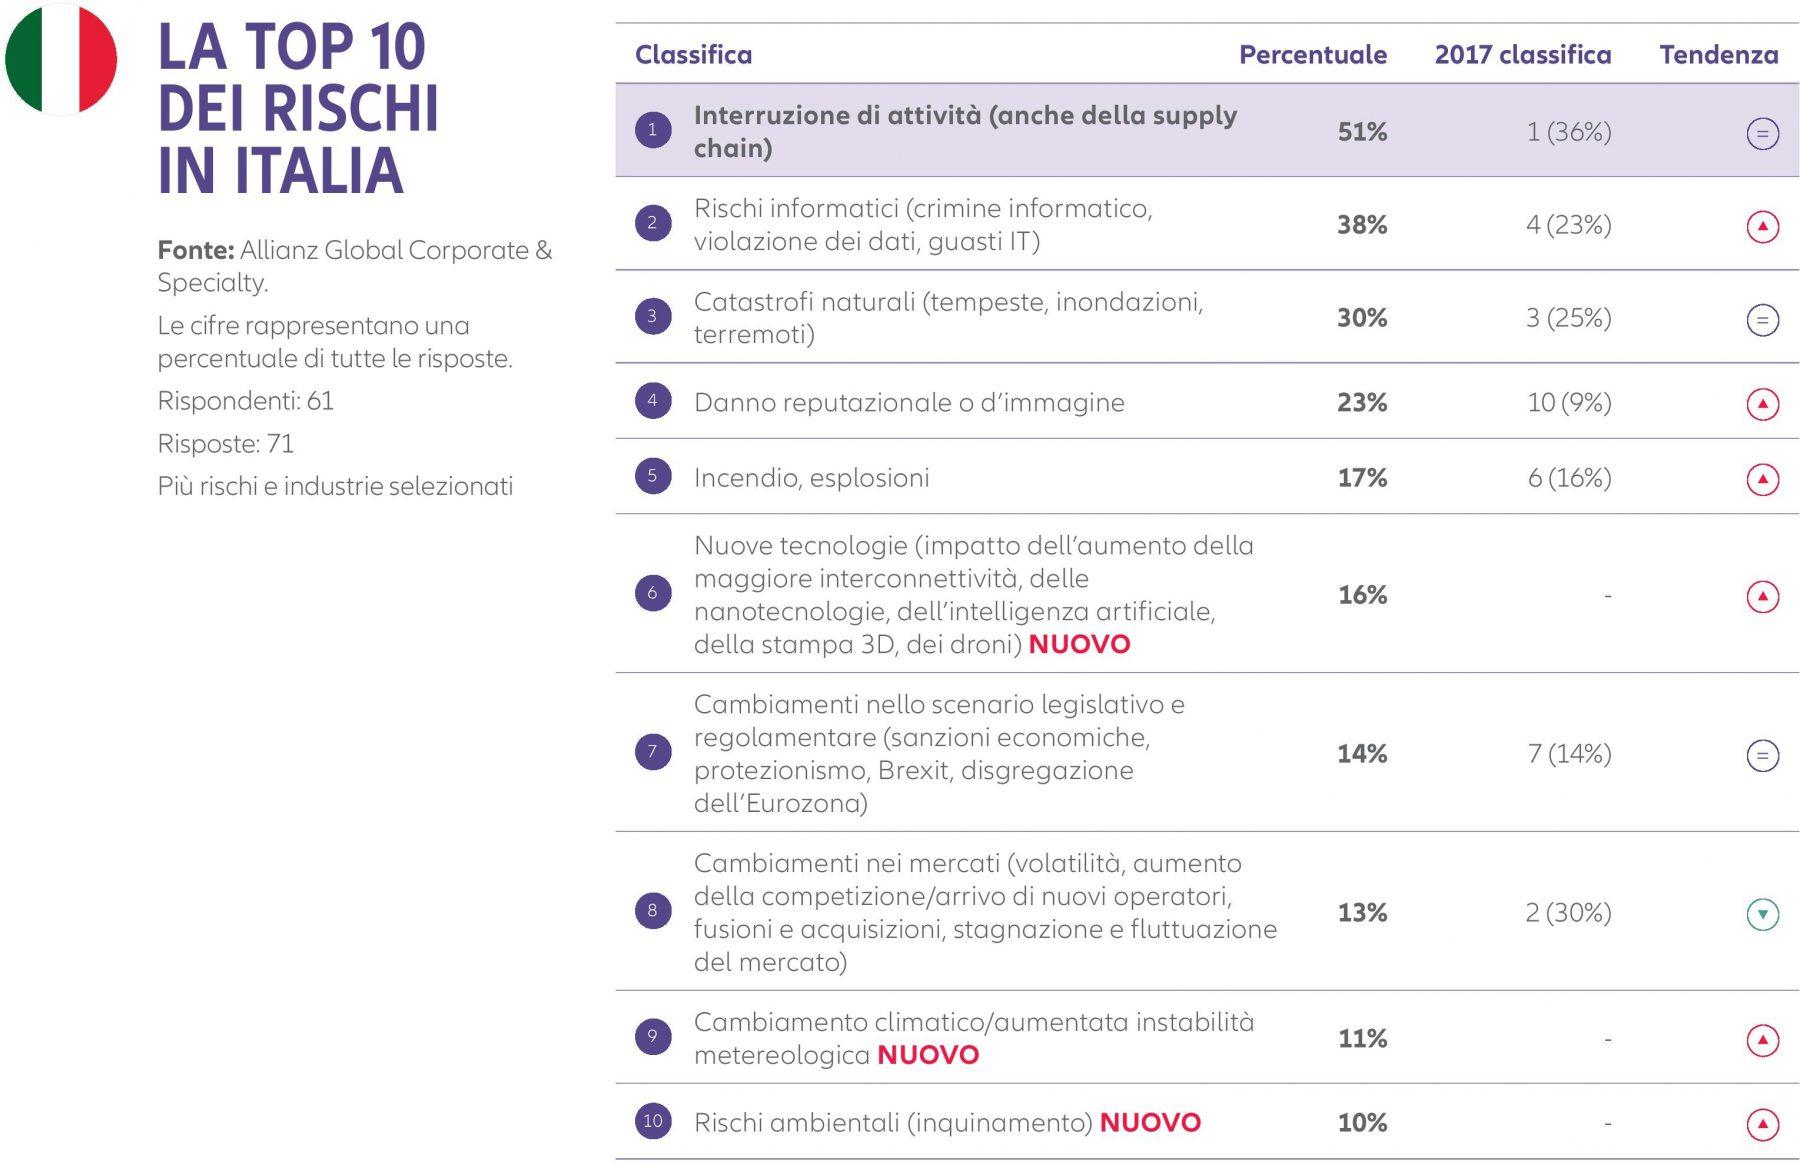 Allianz Risk Barometer 2018 Top 10 Rischi Italia Imc